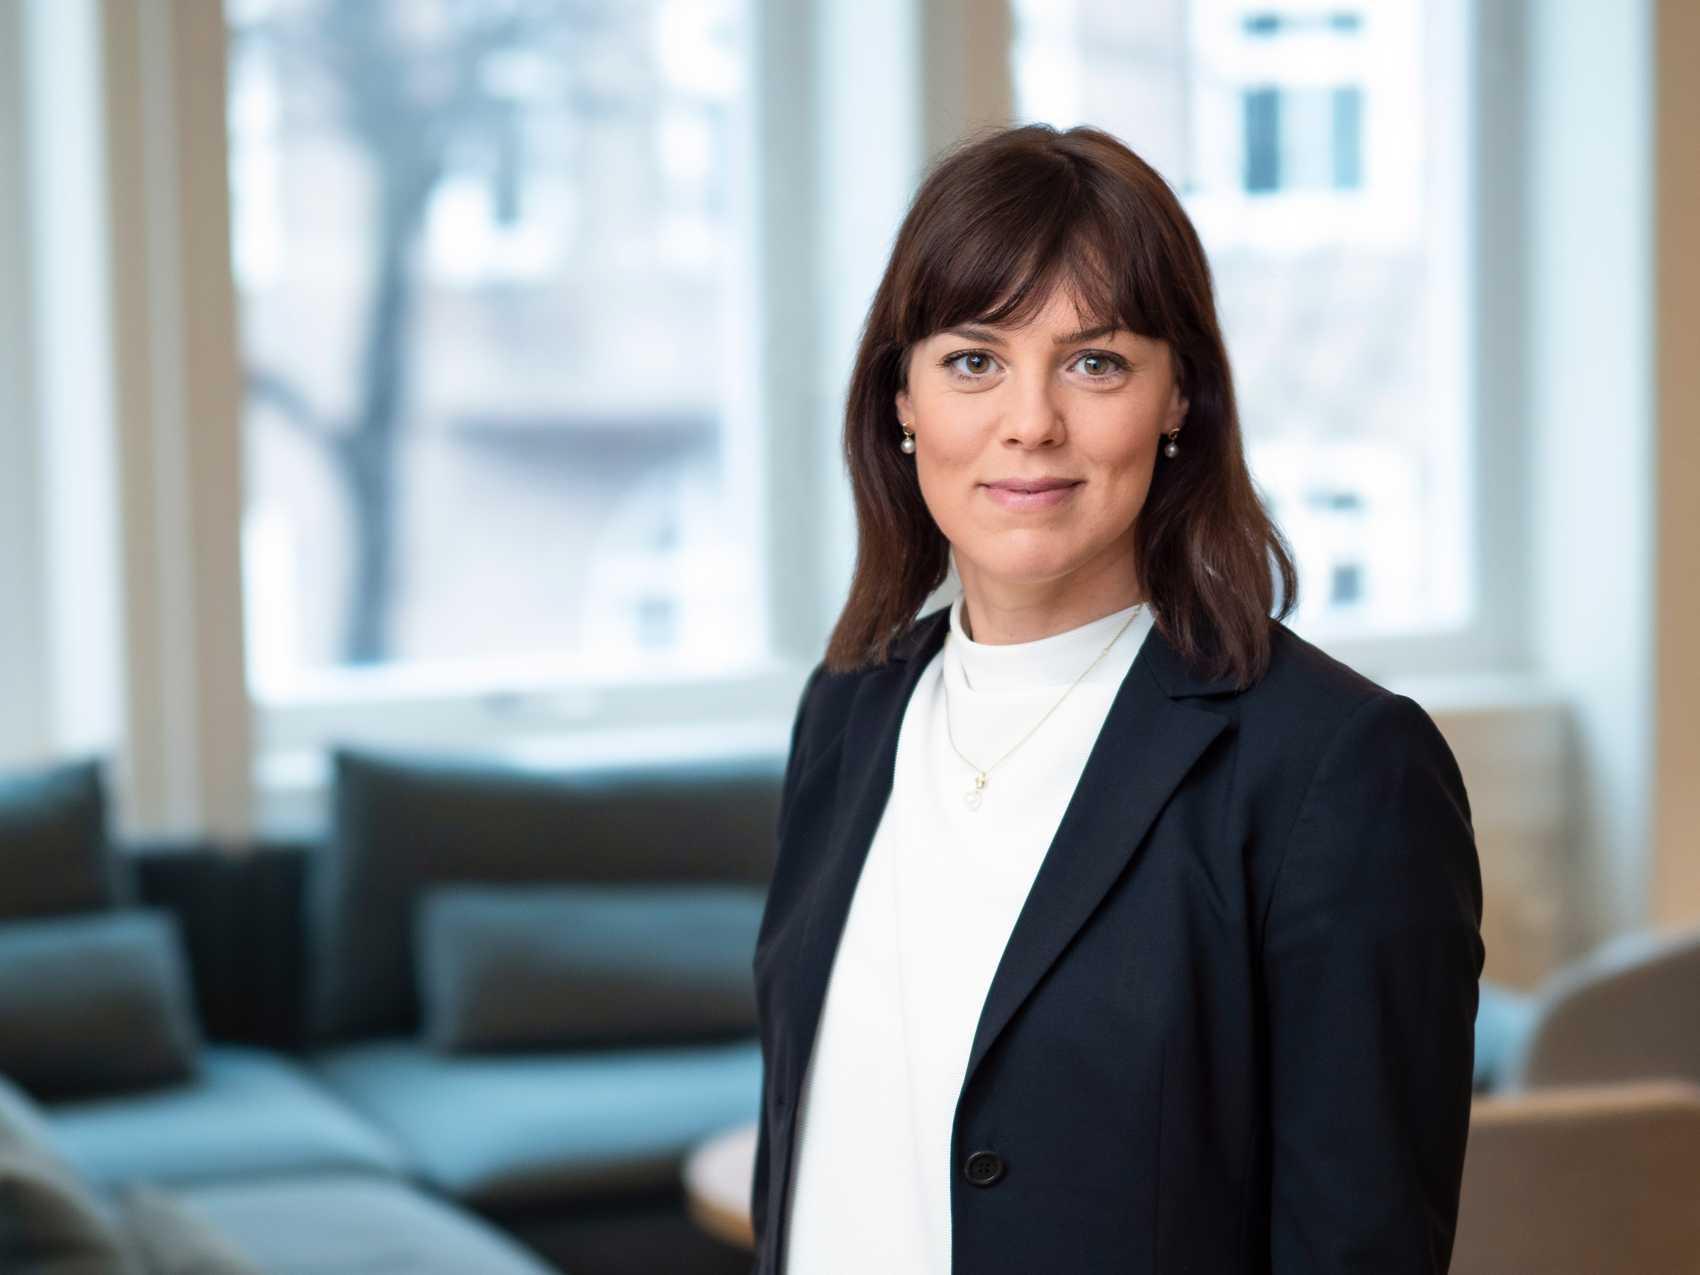 Cementas hållbarhetschef Karin Comstedt Webb.